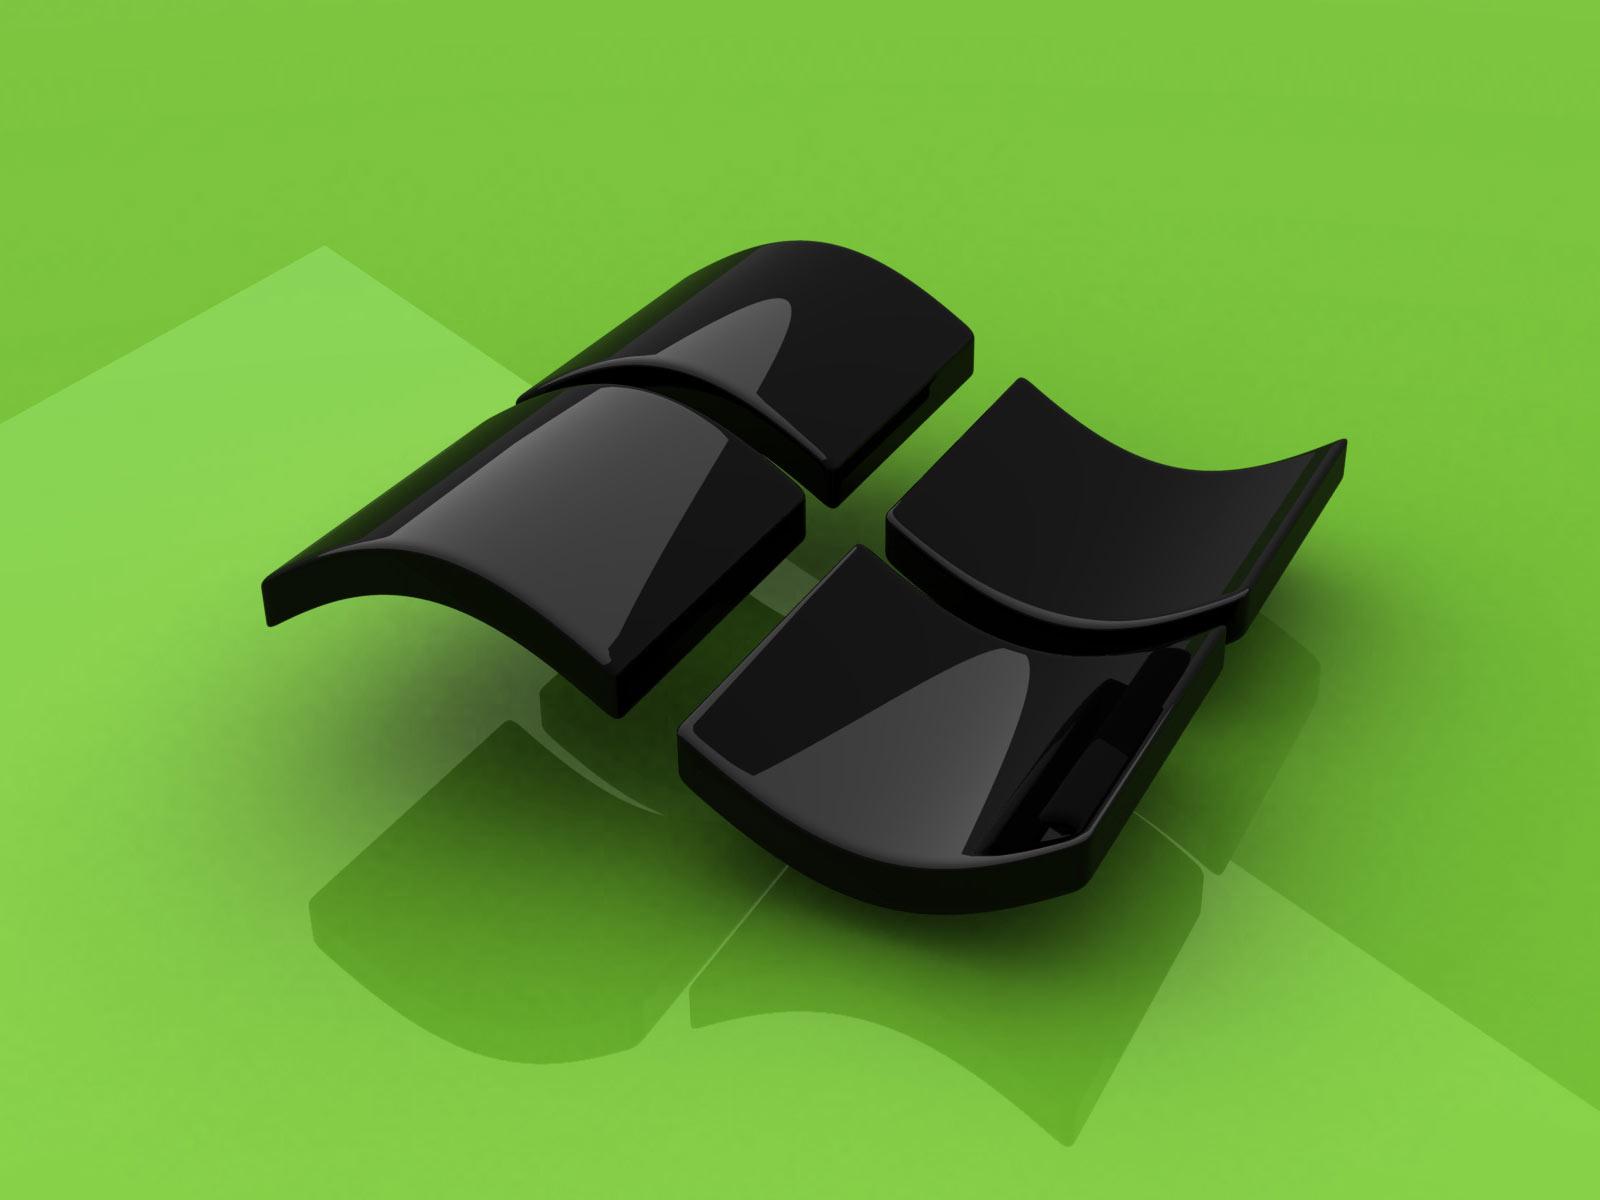 http://1.bp.blogspot.com/_wNRrISXI7pU/S7wSlusg_zI/AAAAAAAAACo/ECPQGL2mUEc/s1600/Vista_Black_Gloss.jpg